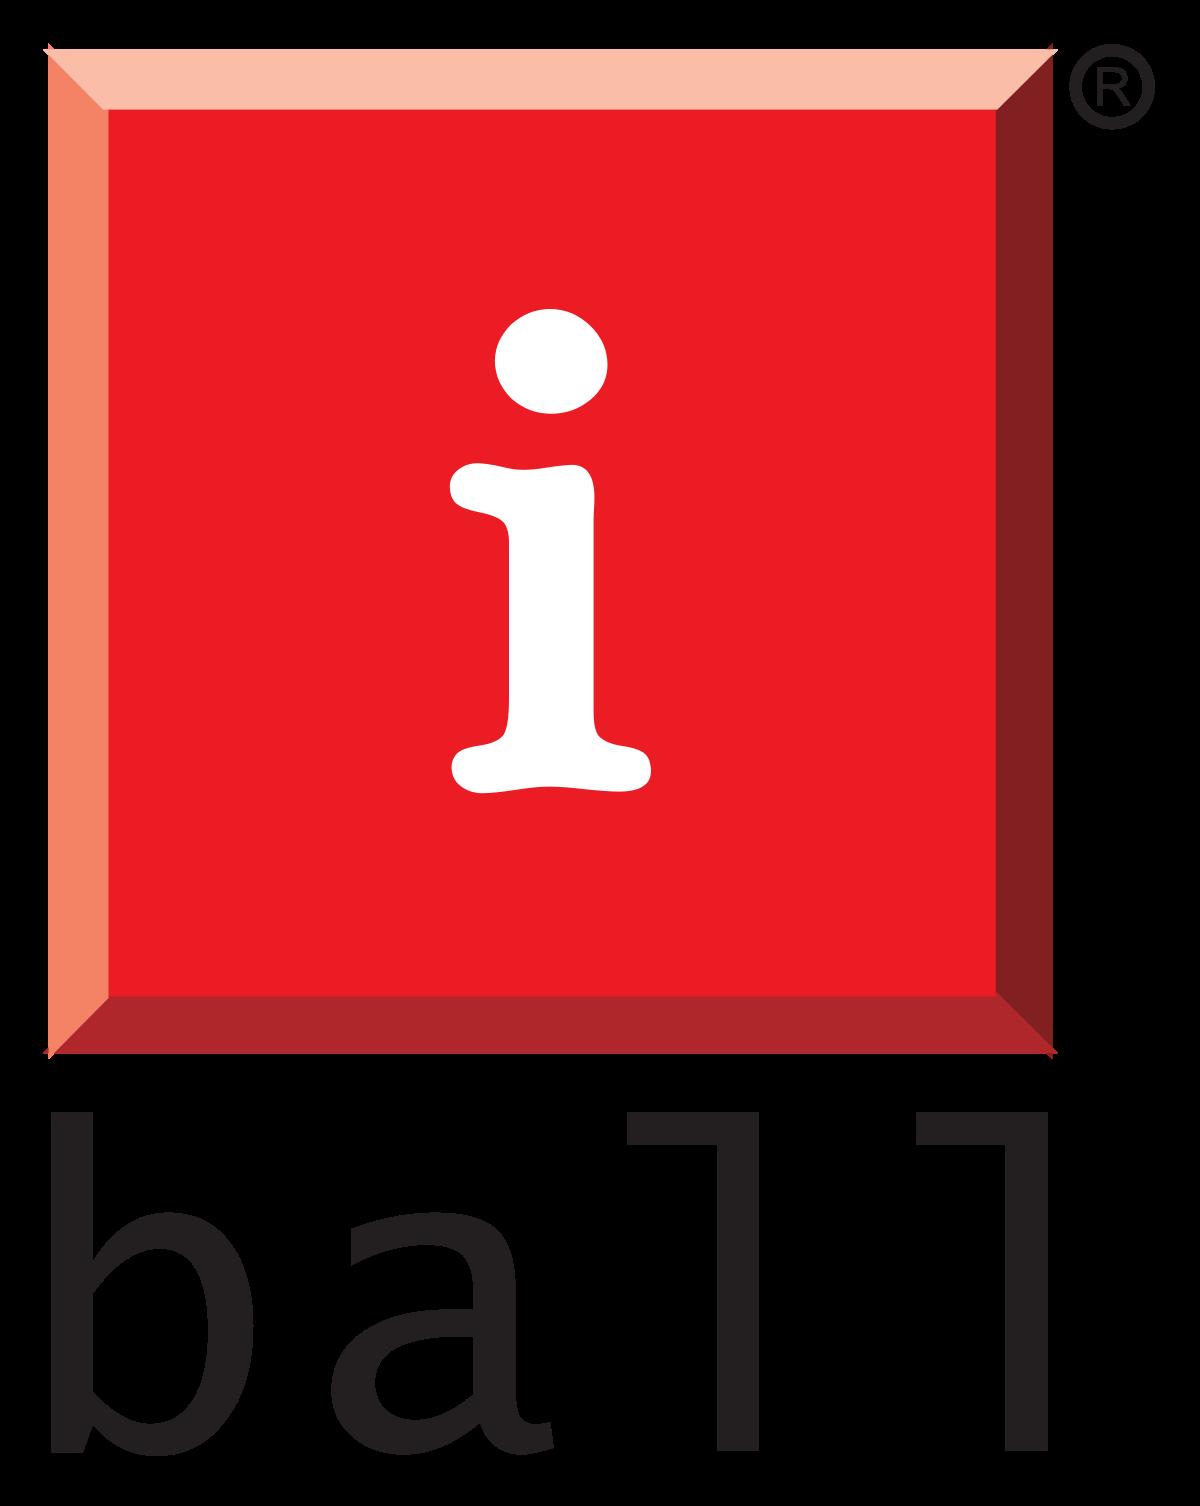 All mobile company logo clipart vector royalty free library iBall (company) - Wikipedia vector royalty free library